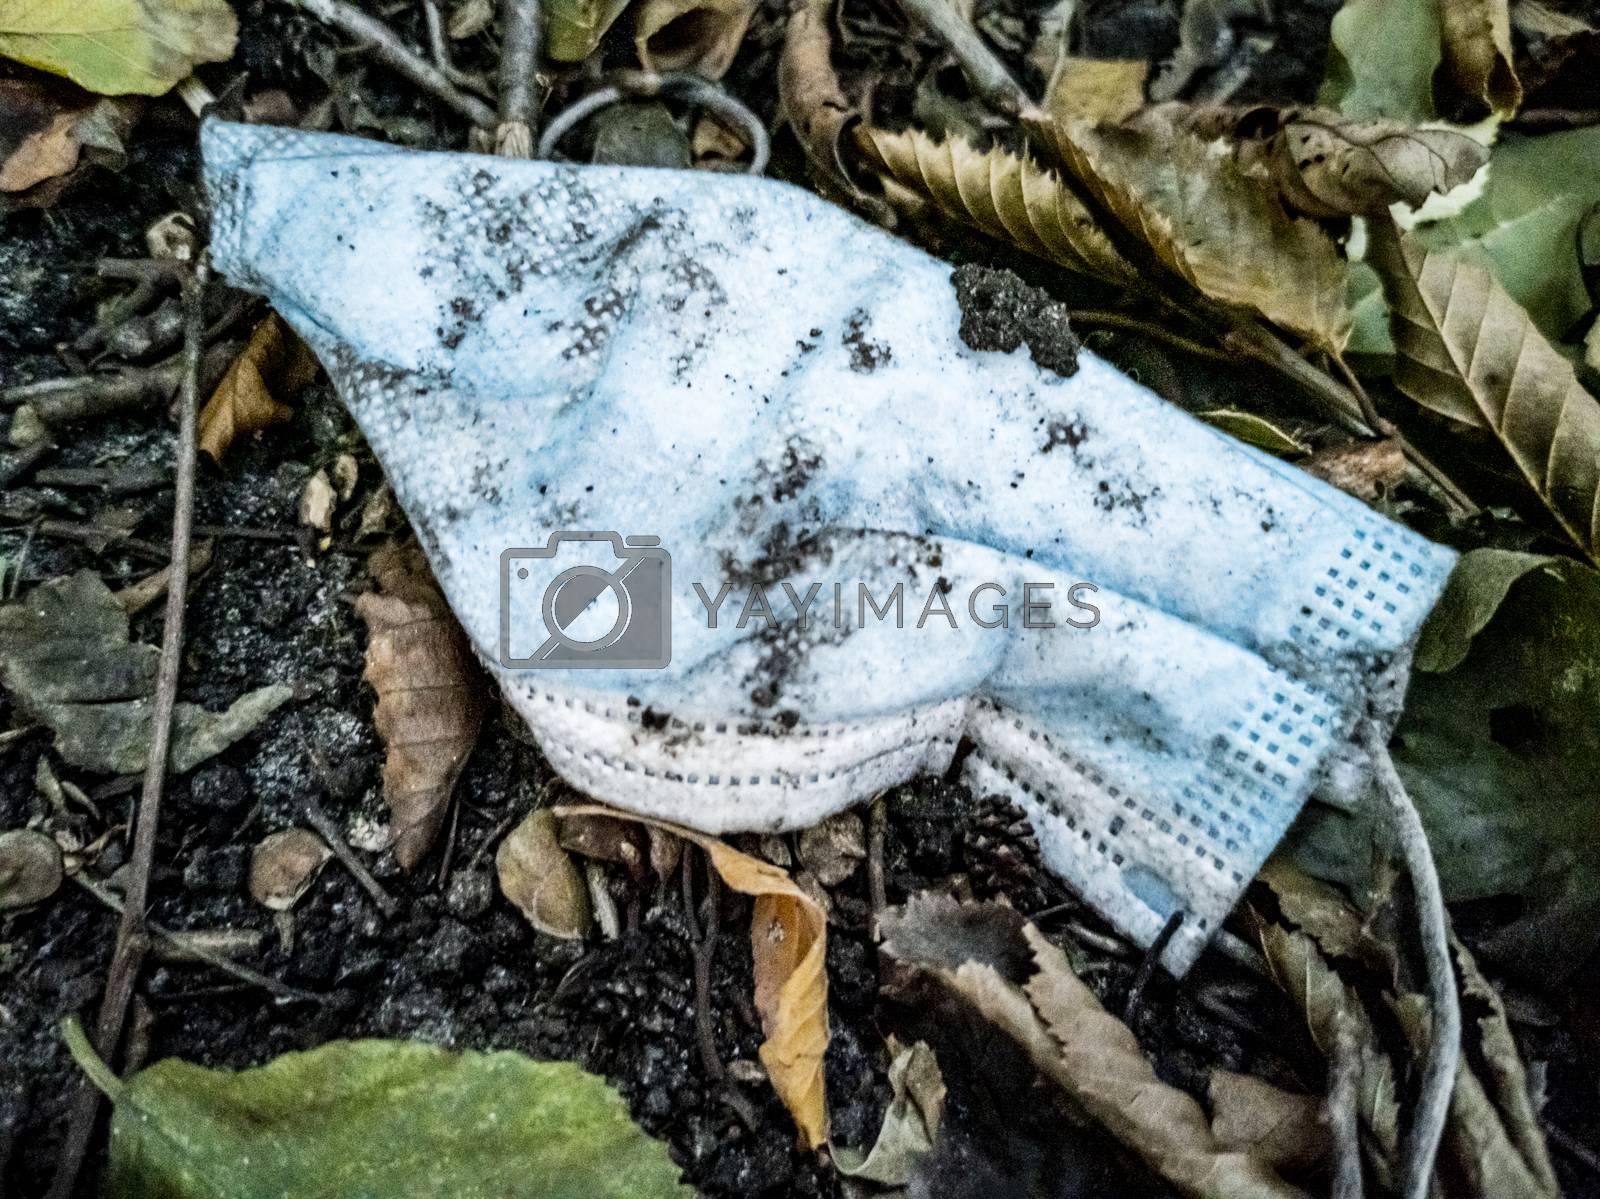 Dirty surgical masks in nature. Corona virus pollution. Leherheide, Bremerhaven.